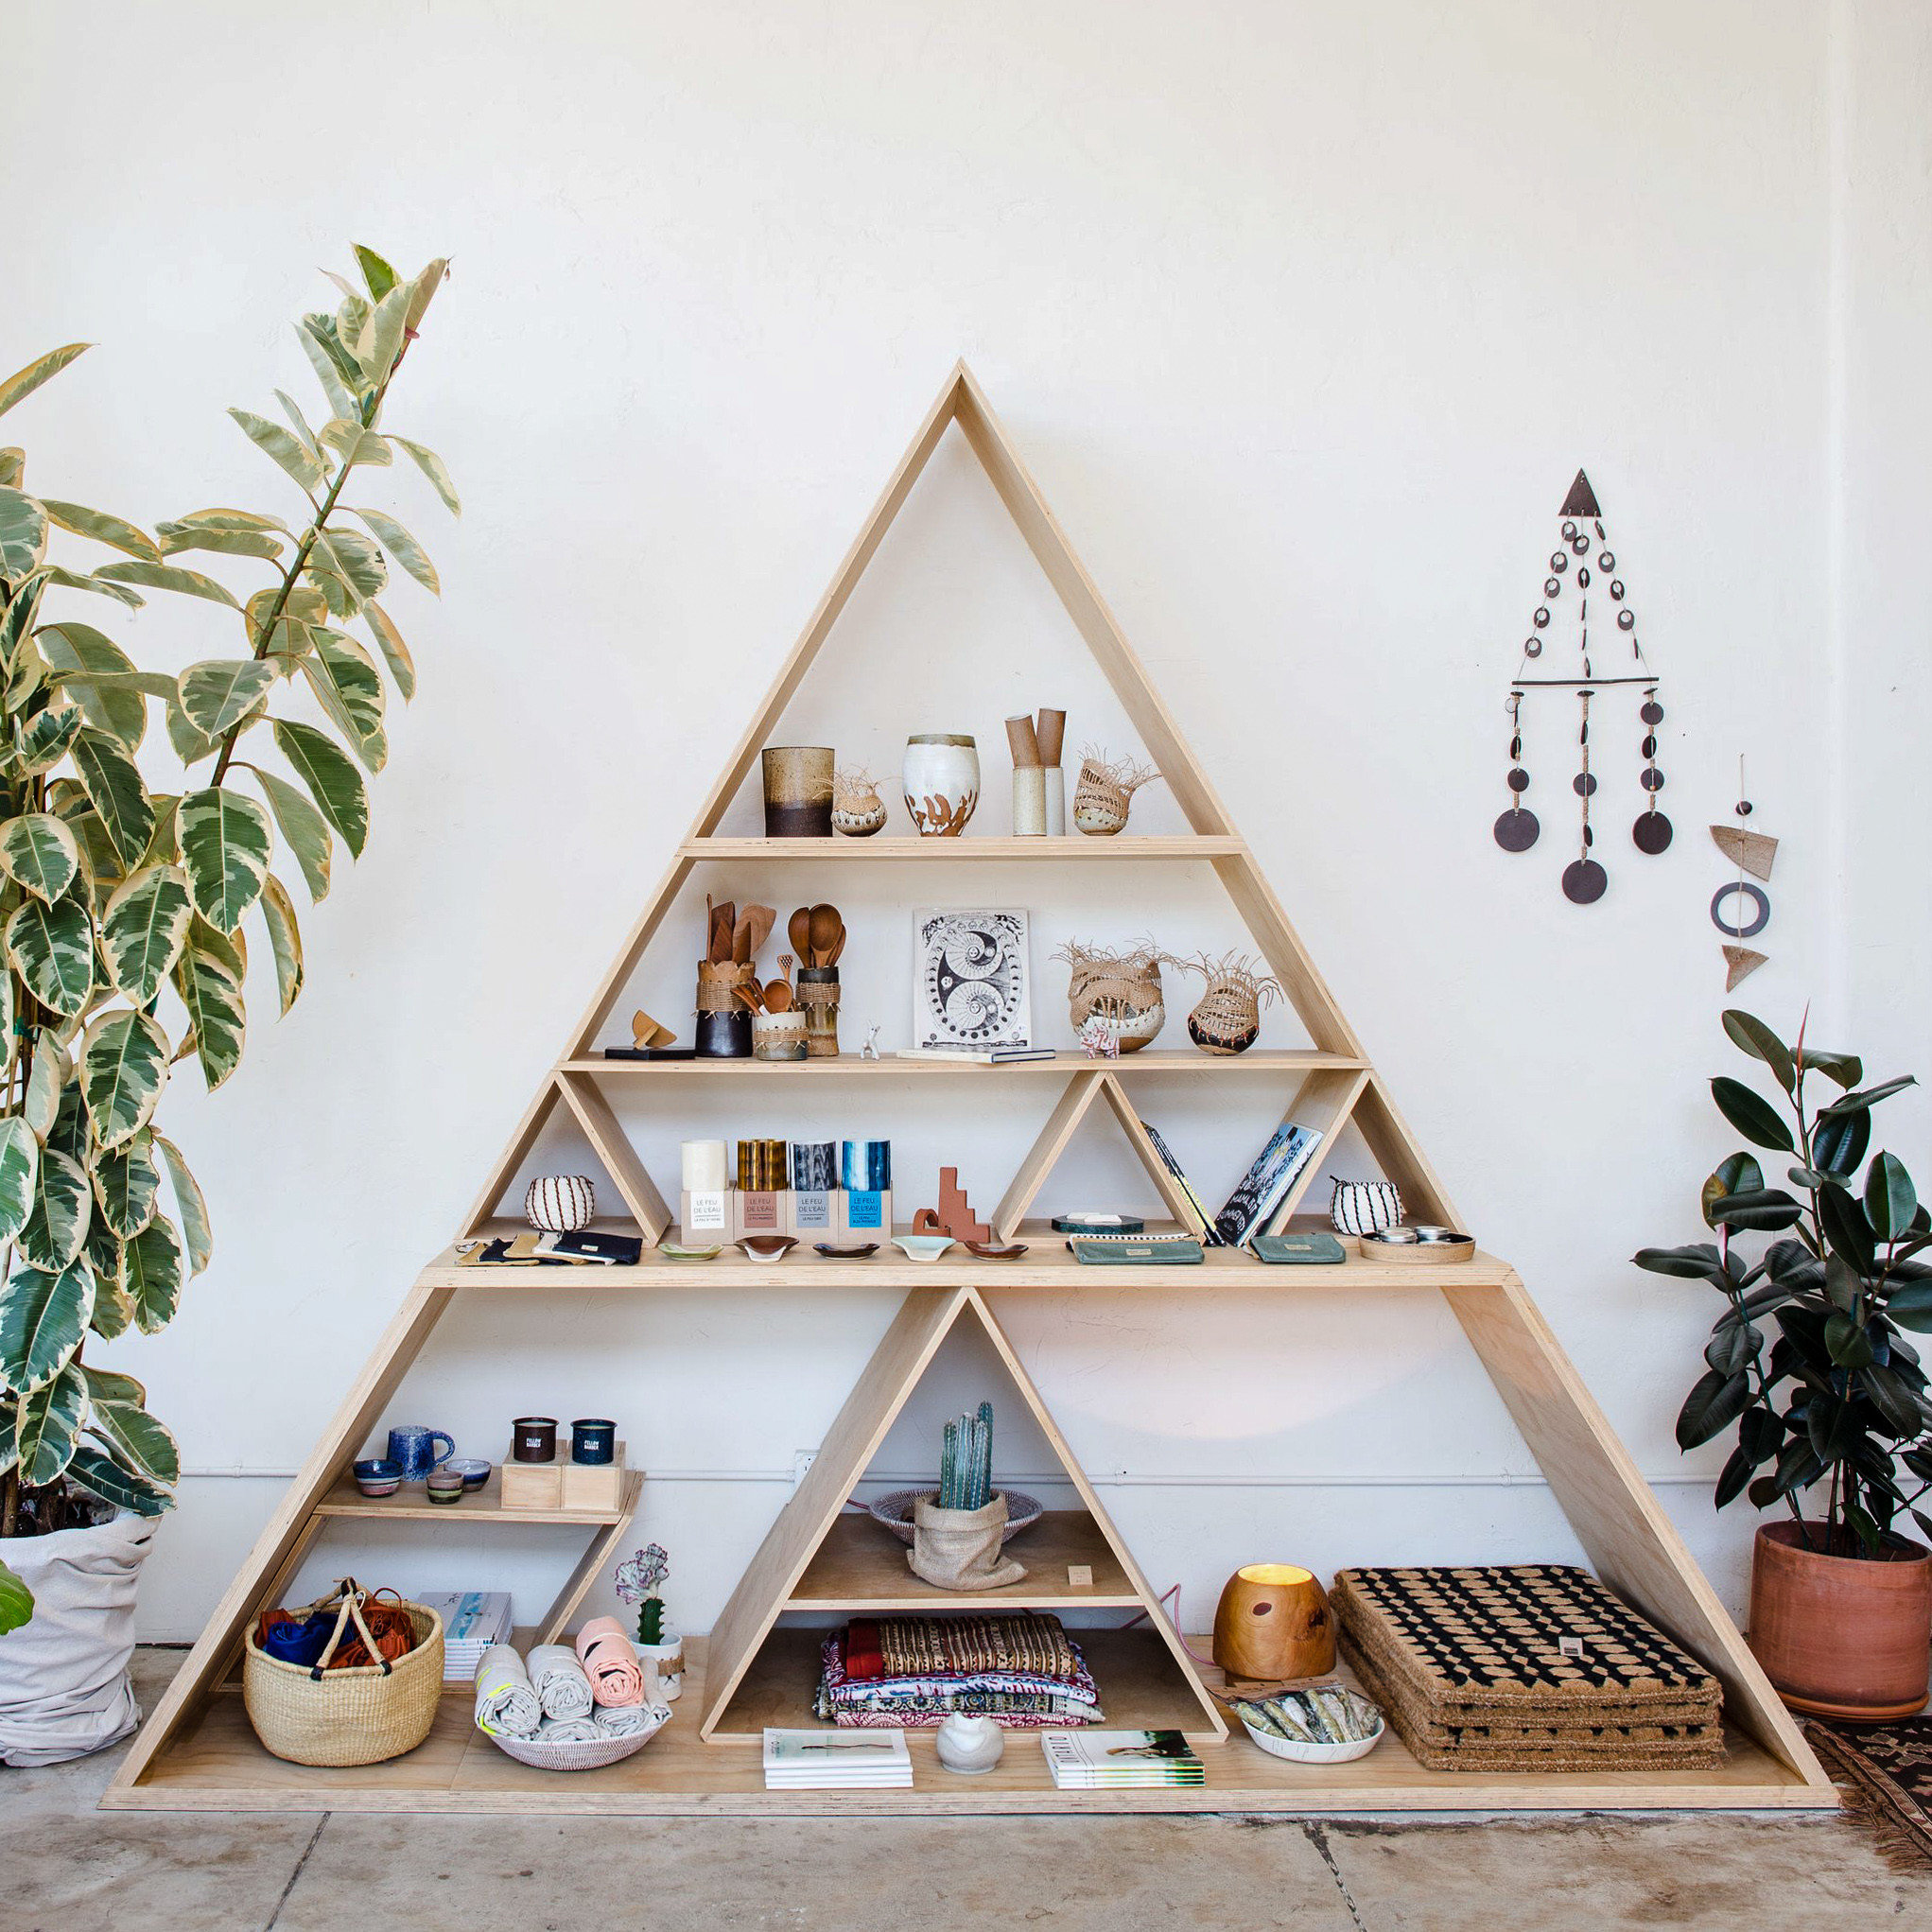 Travel Shop home shelf shelving christmas decoration wood decor Christmas tree angle furniture